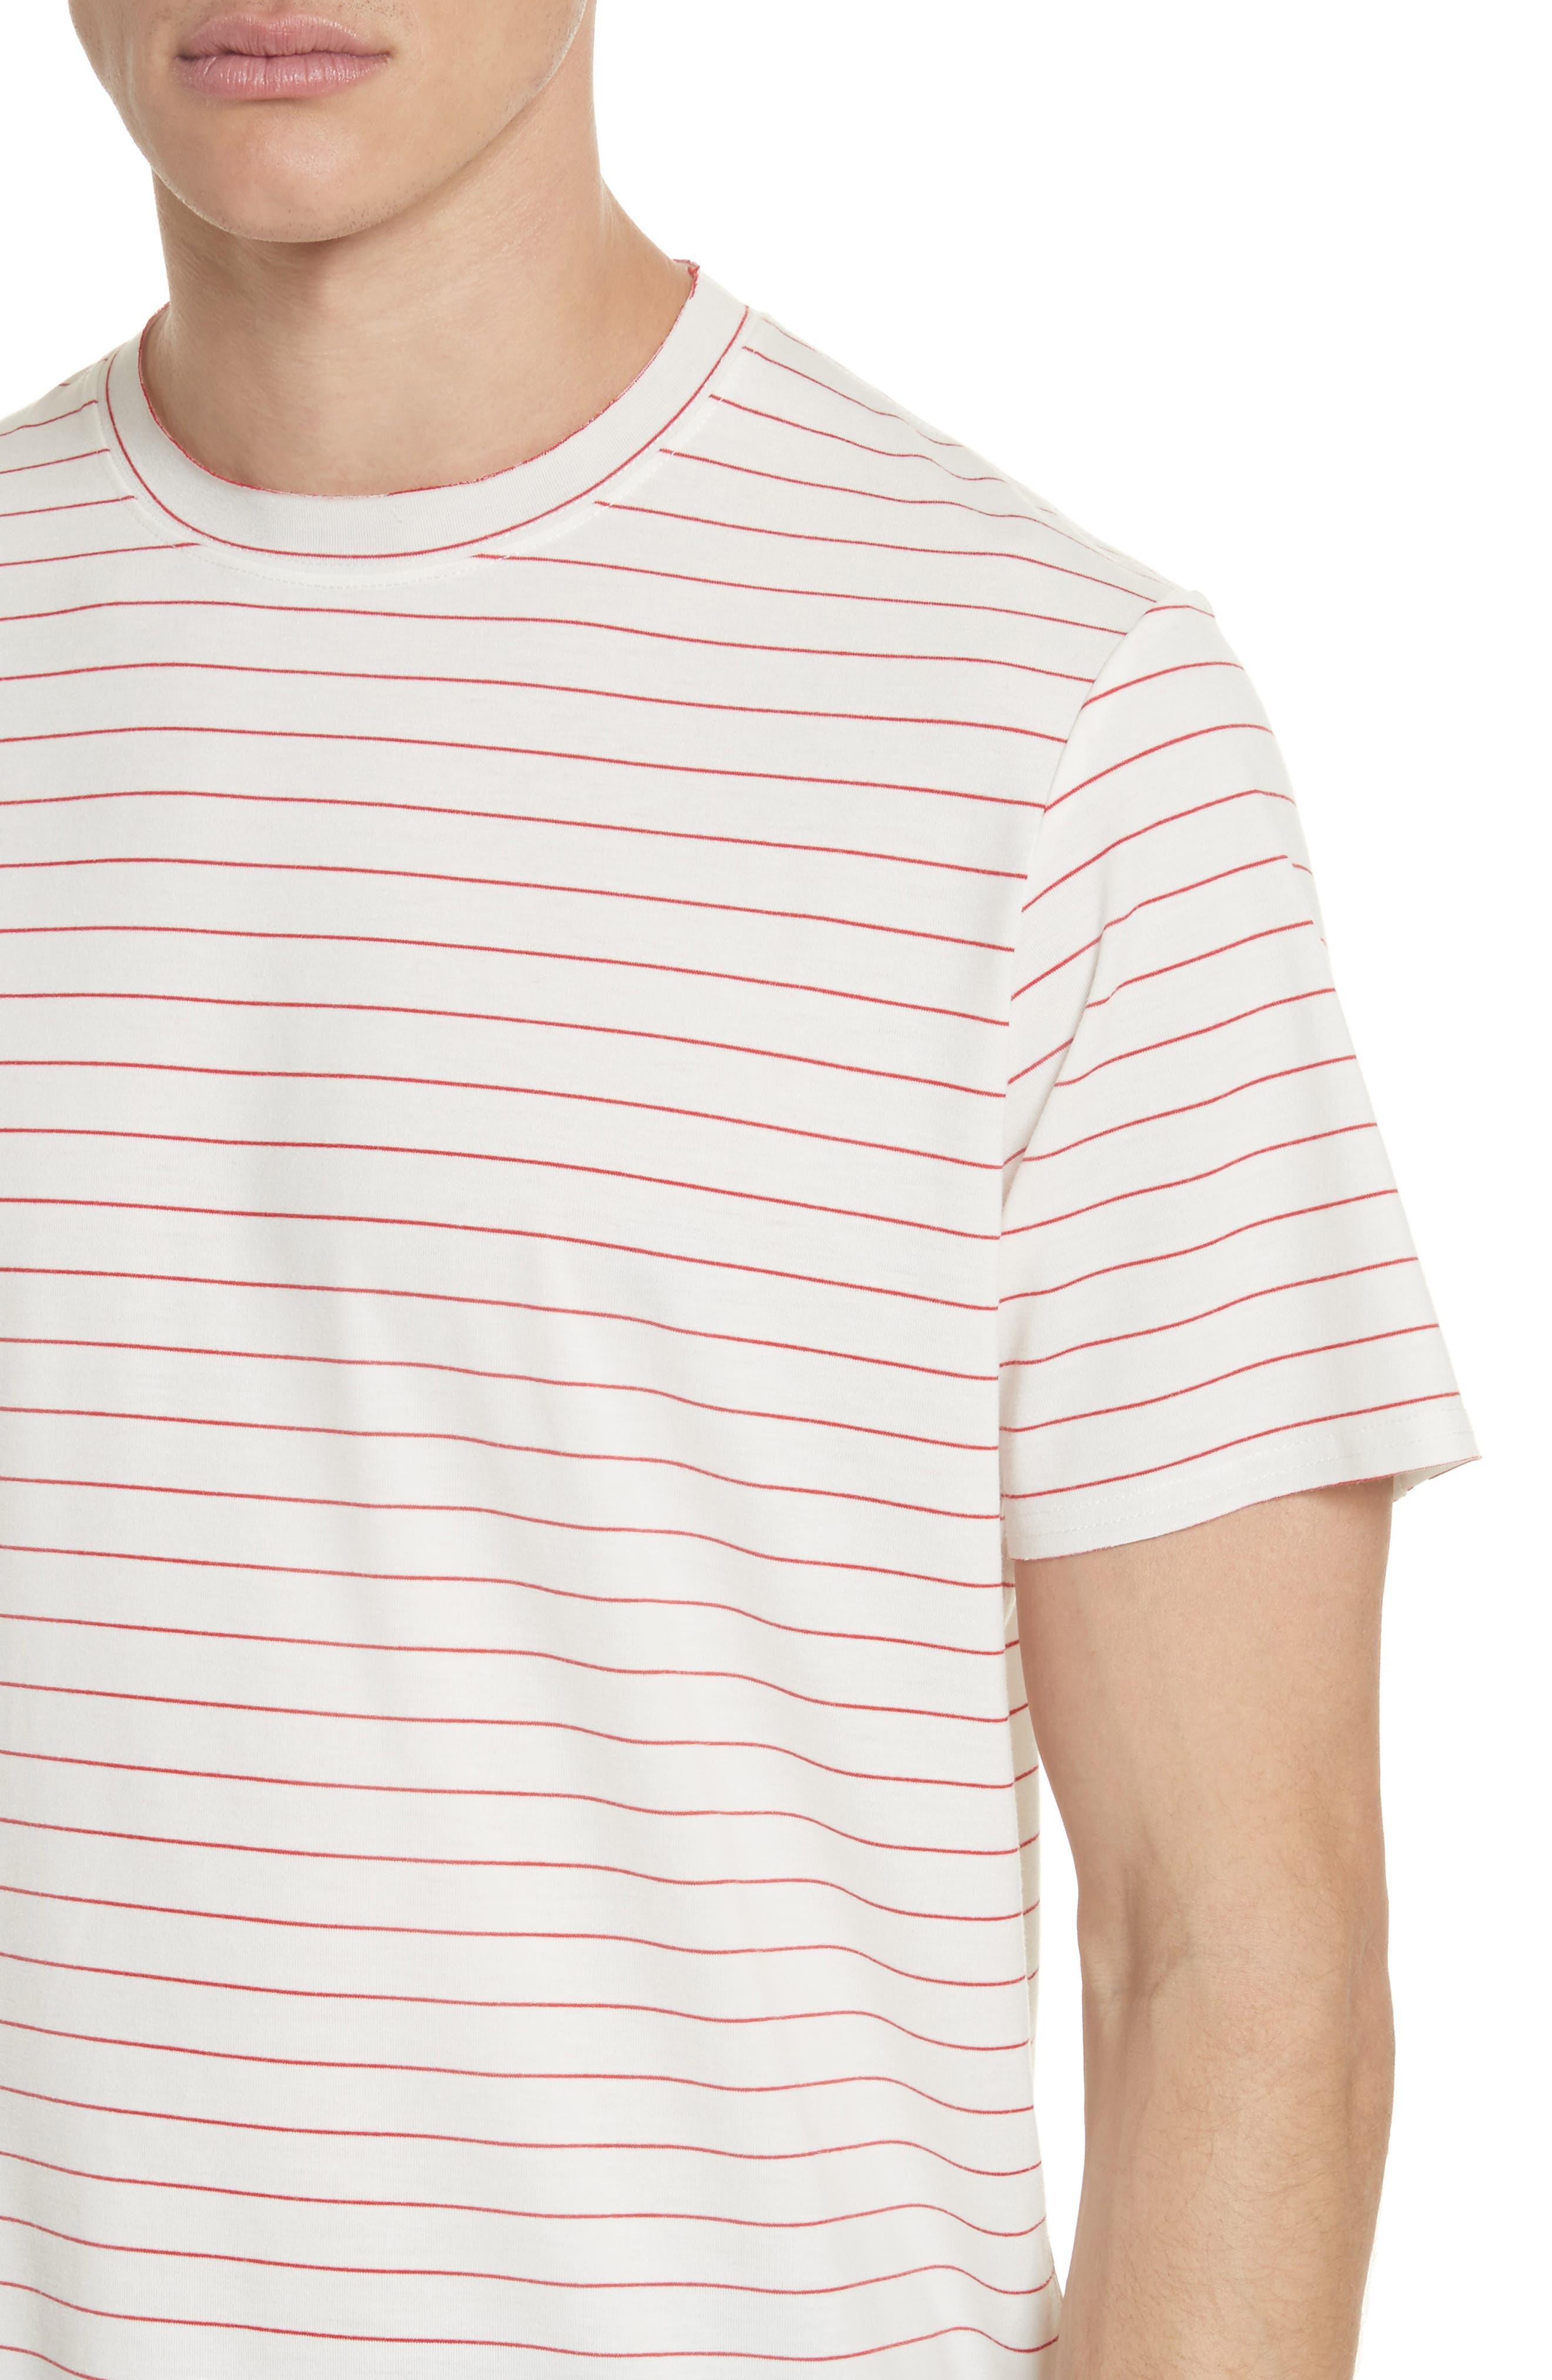 Stripe Crewneck T-Shirt,                             Alternate thumbnail 4, color,                             White/ Red